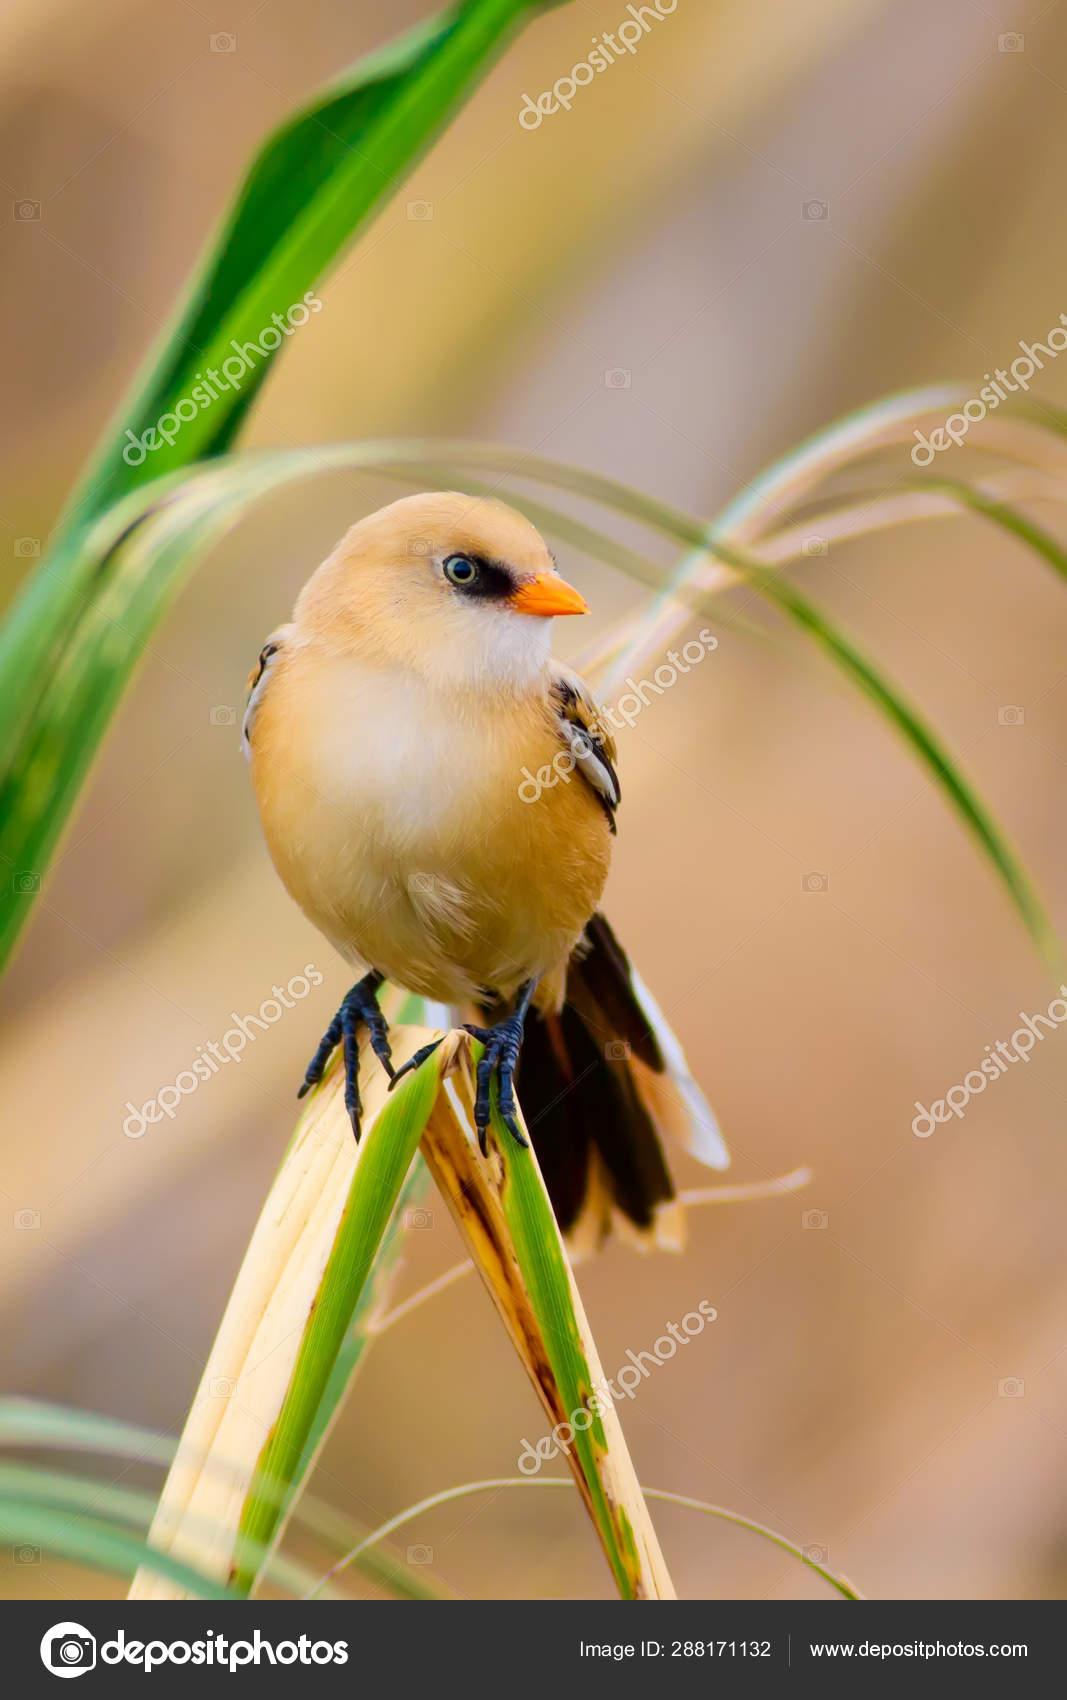 Cute Birds Black Nature Background Bearded Reedling Panurus Biarmicus Stock Photo C Mutan7 288171132